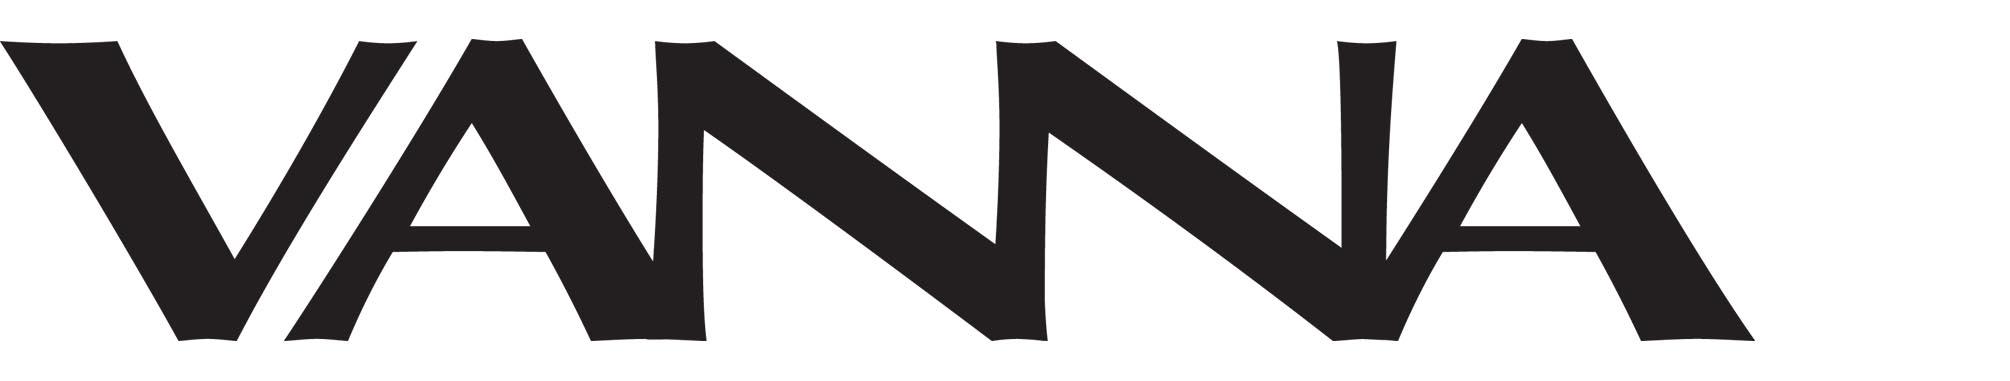 vanna-logo-banner.jpg